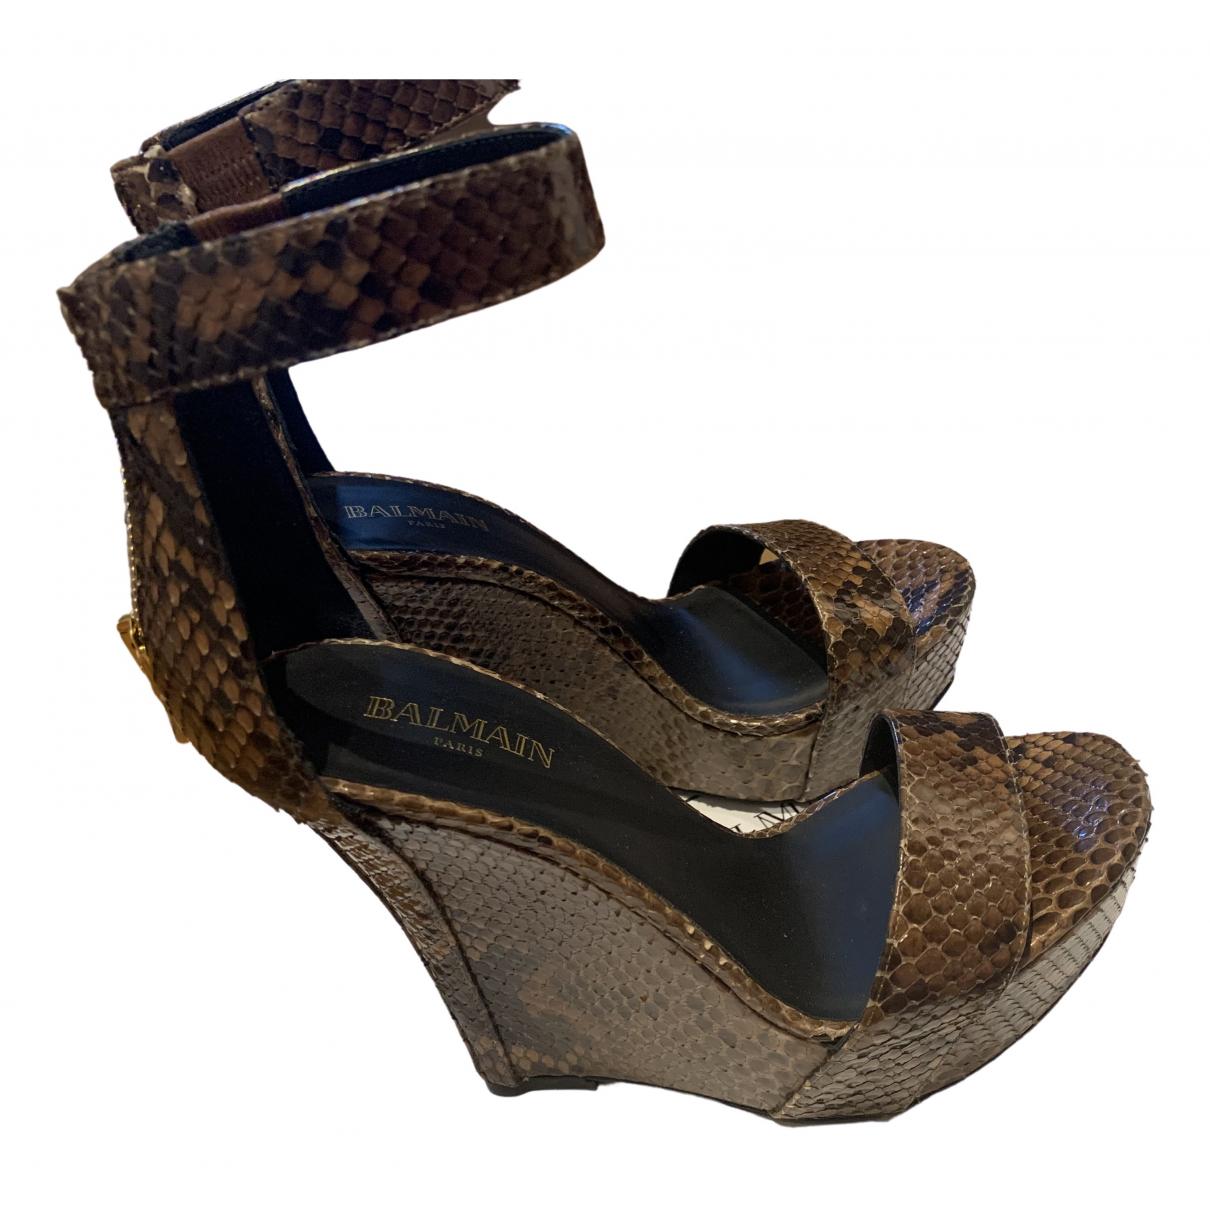 Sandalias de Piton Balmain